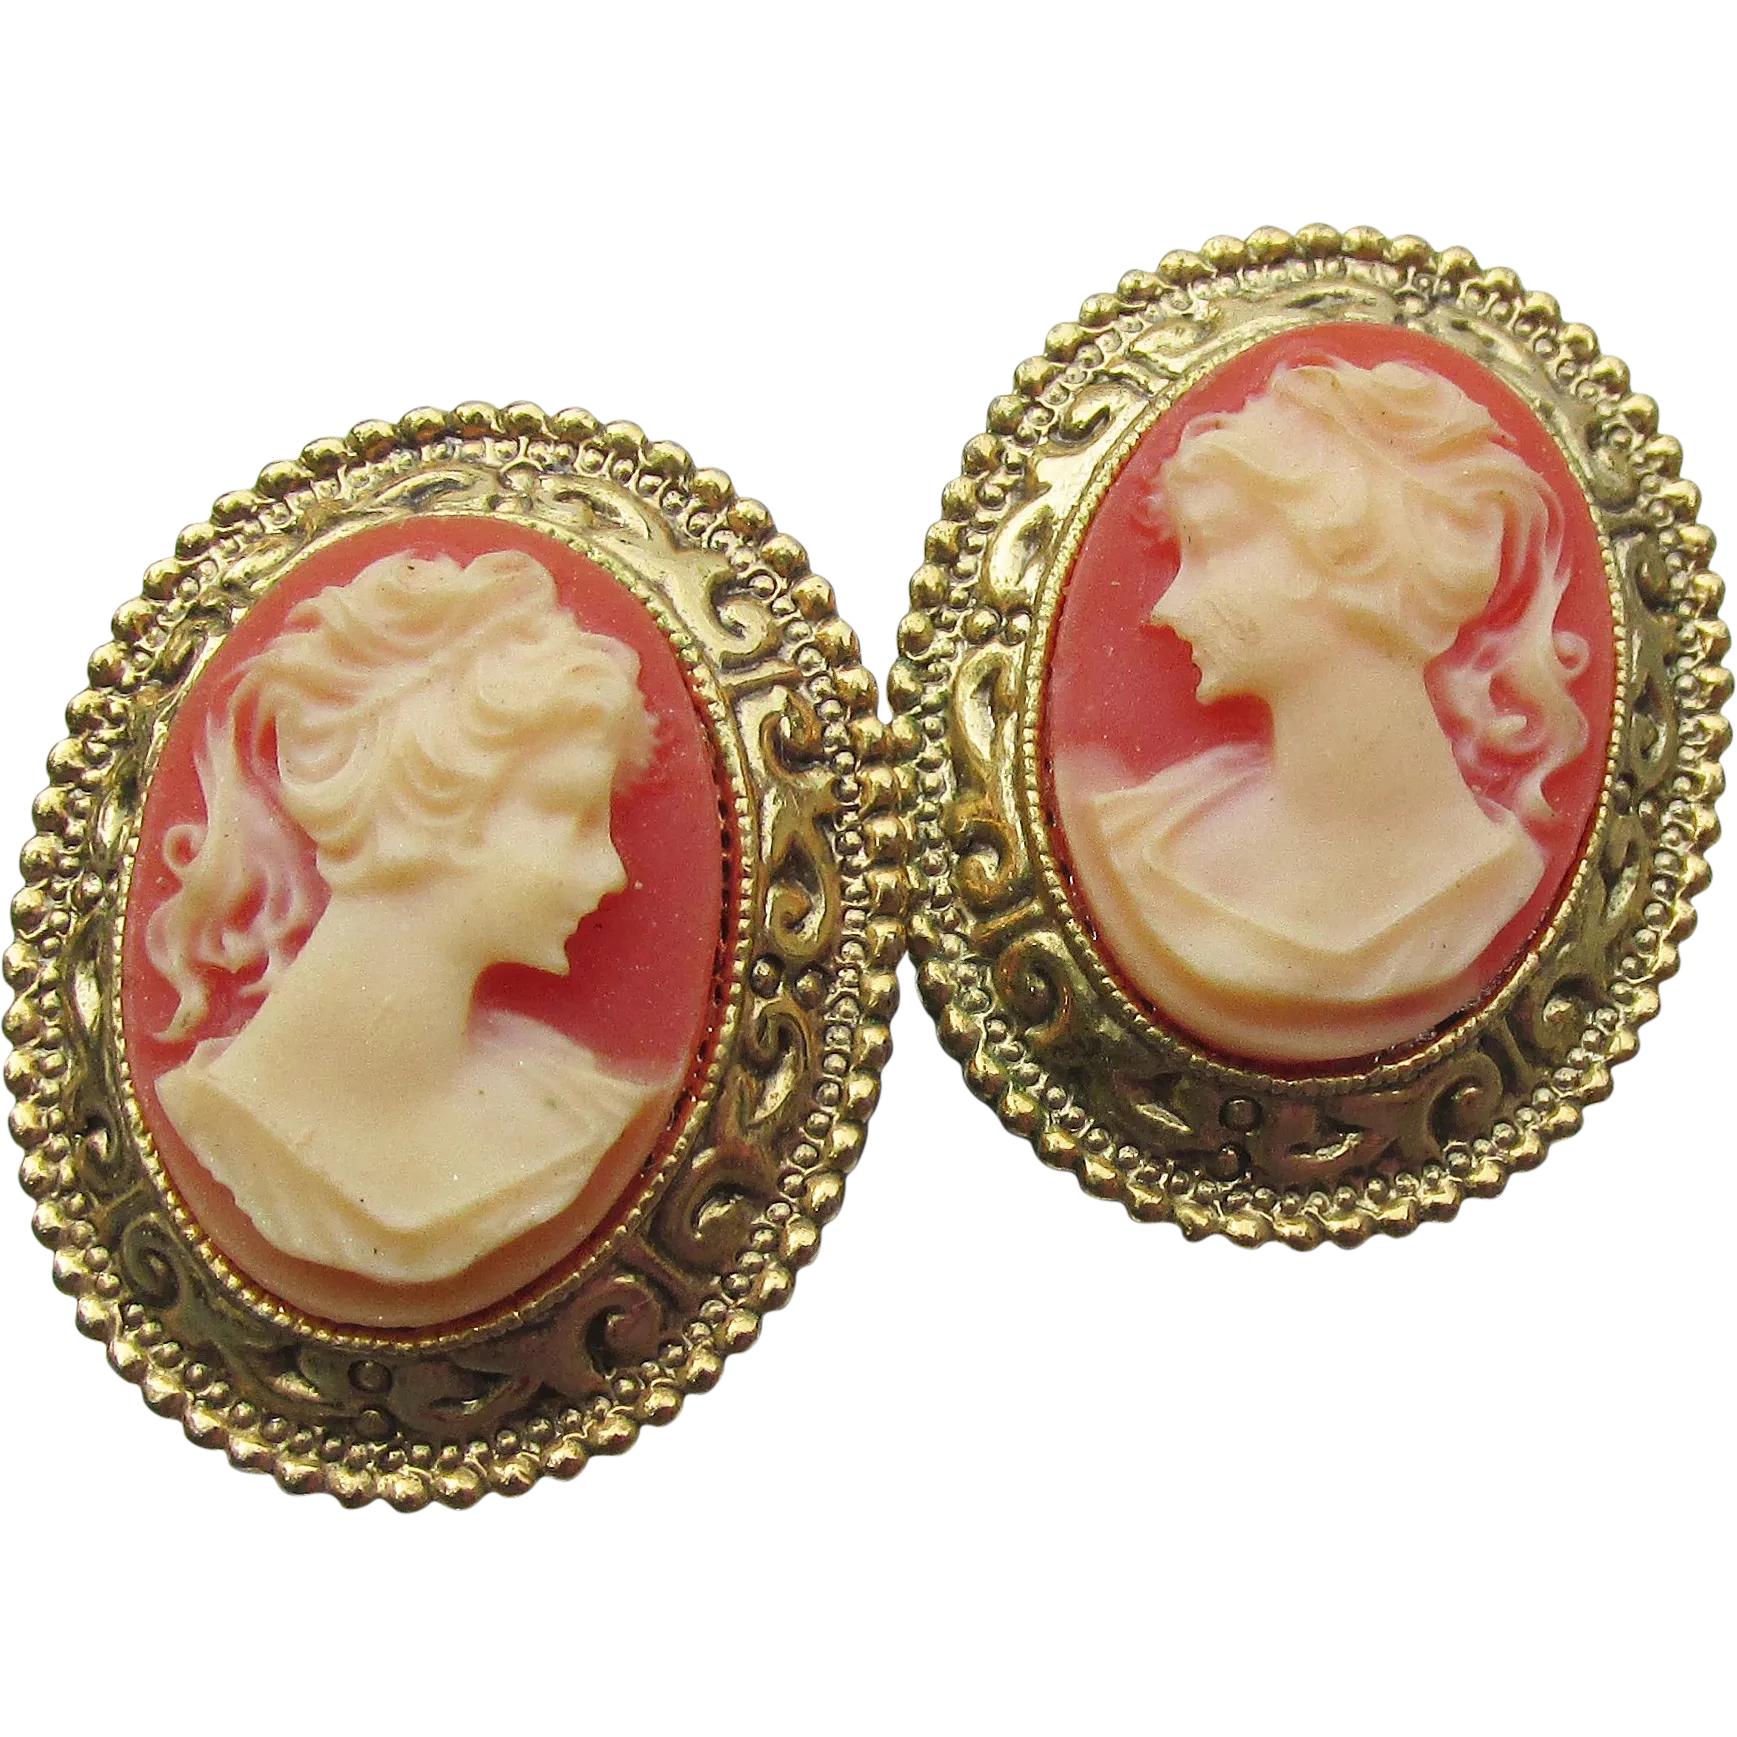 1928 Jewelry Company Cameo Earrings